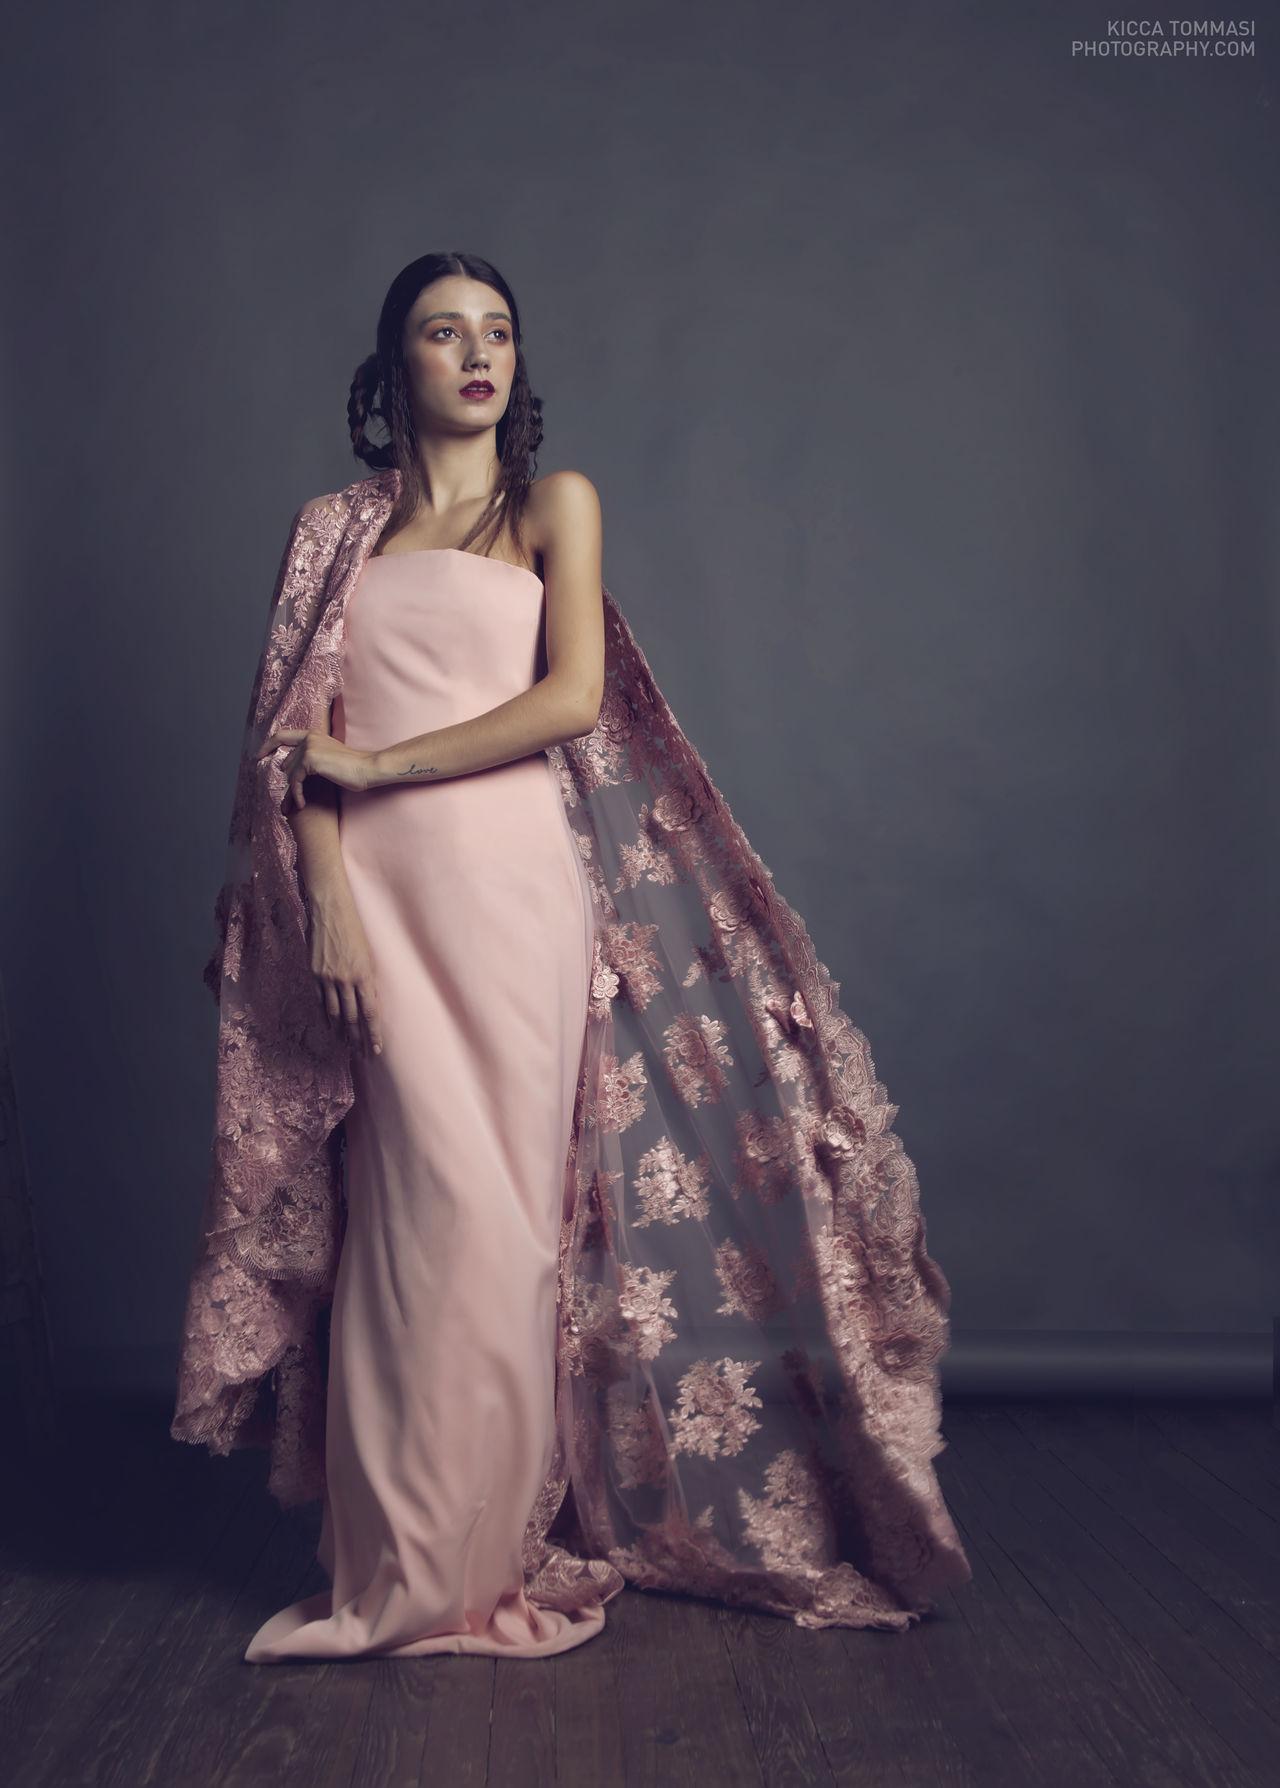 Lara, our Lady of Millennial Pink Beautiful Woman Dress Elégance Evening Gown Full Length Full Length Portrait Millennial Pink One Woman Only Studio Photography Studio Shot Woman Woman Portrait